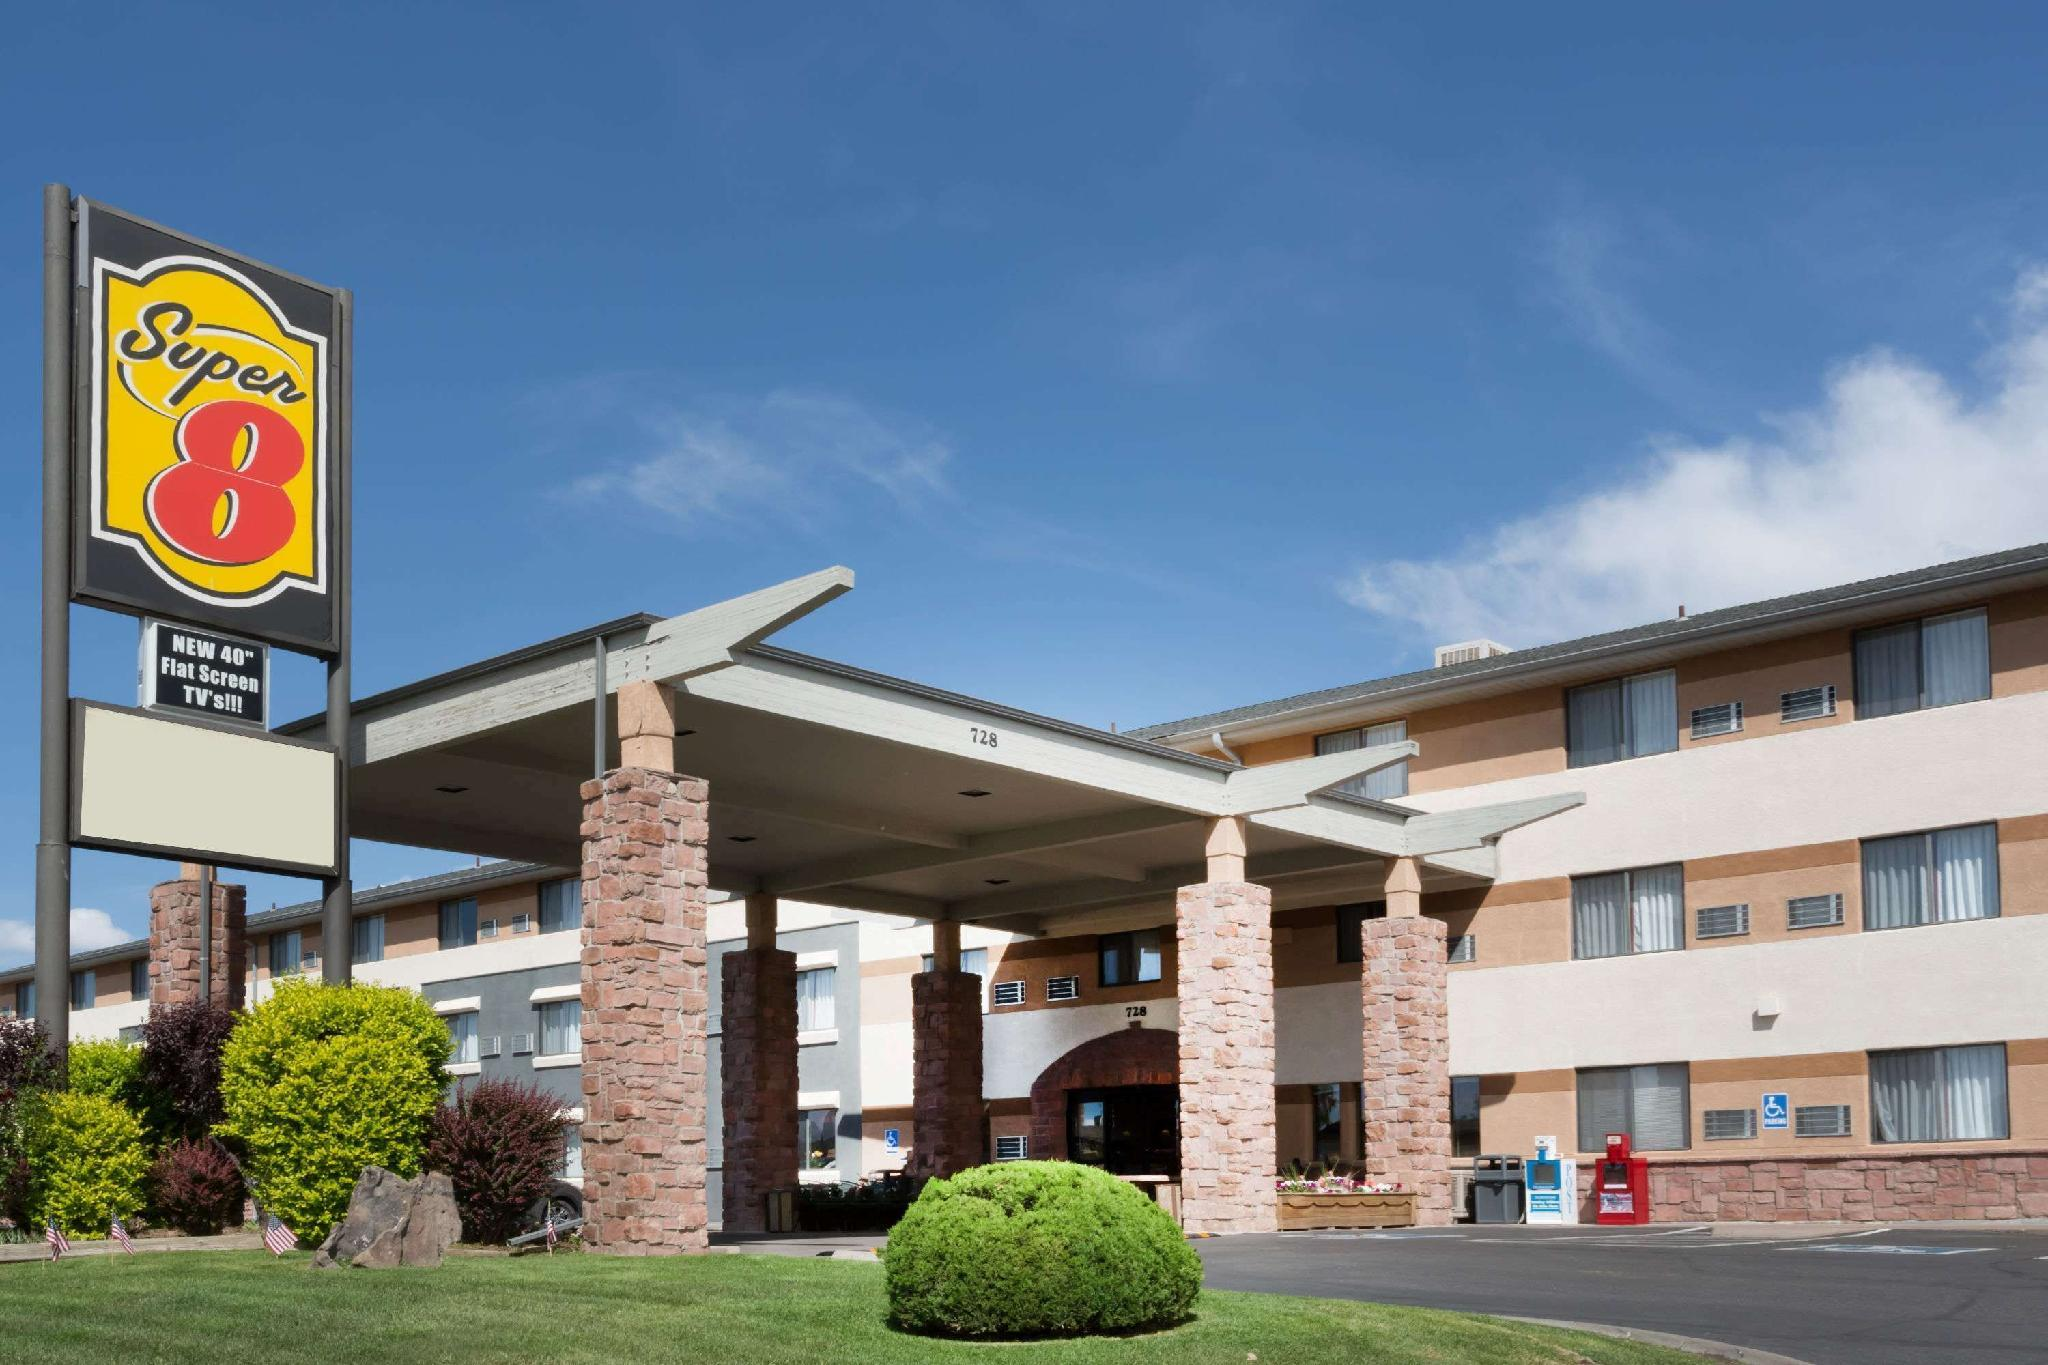 Super 8 By Wyndham Grand Junction Colorado